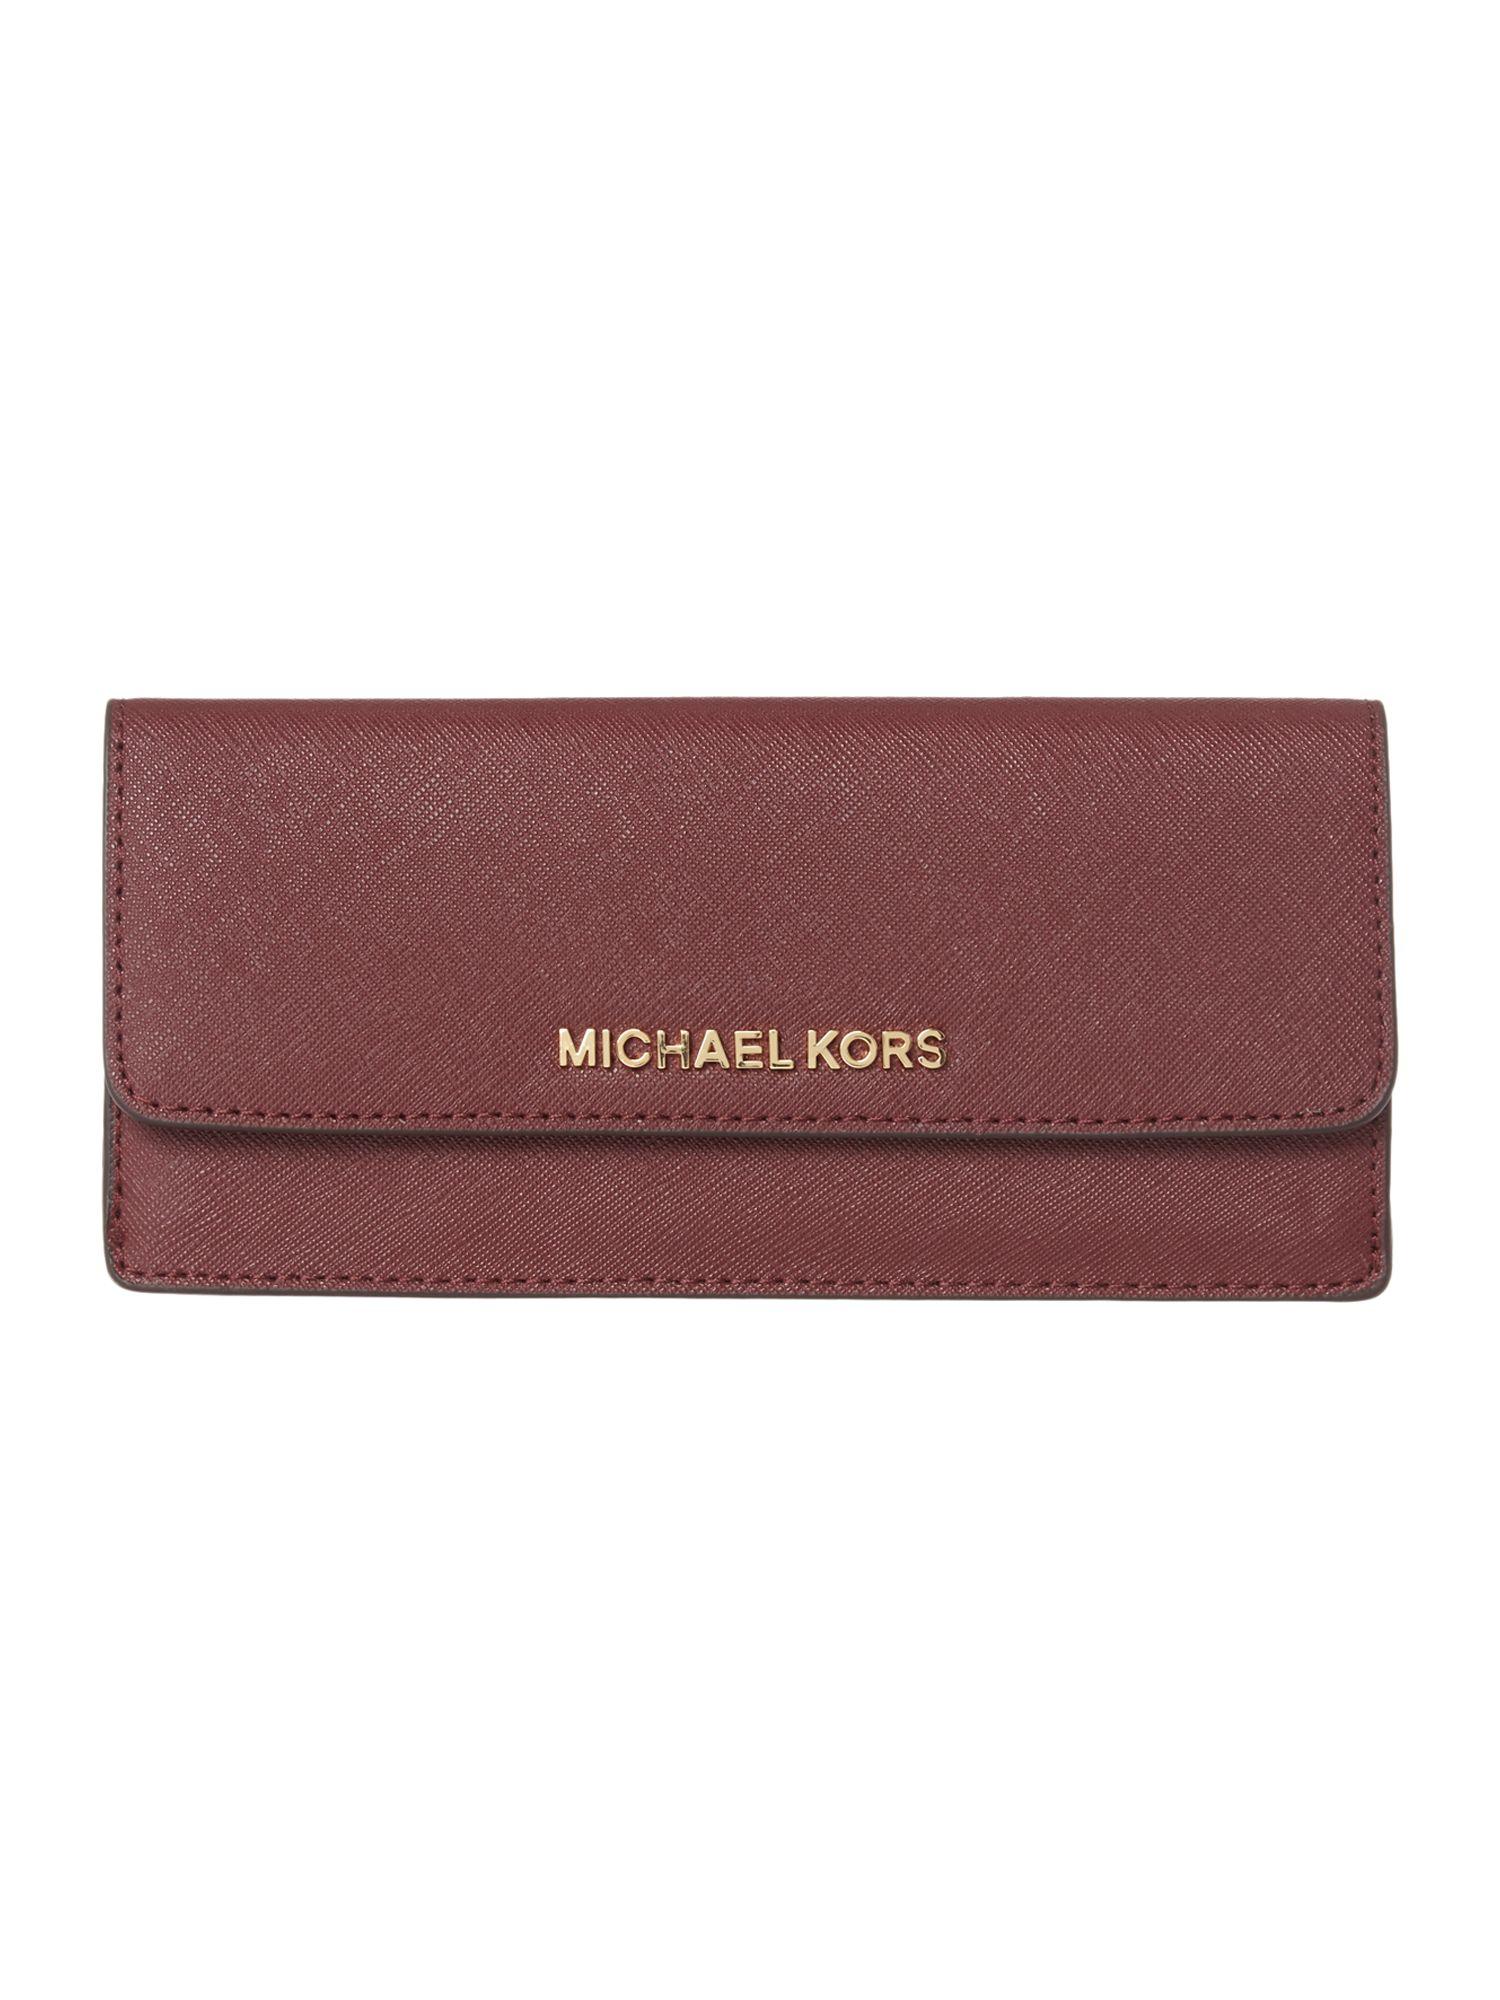 3fce8958bb34 michael kors tan flap over purse pink bag macys - Marwood ...